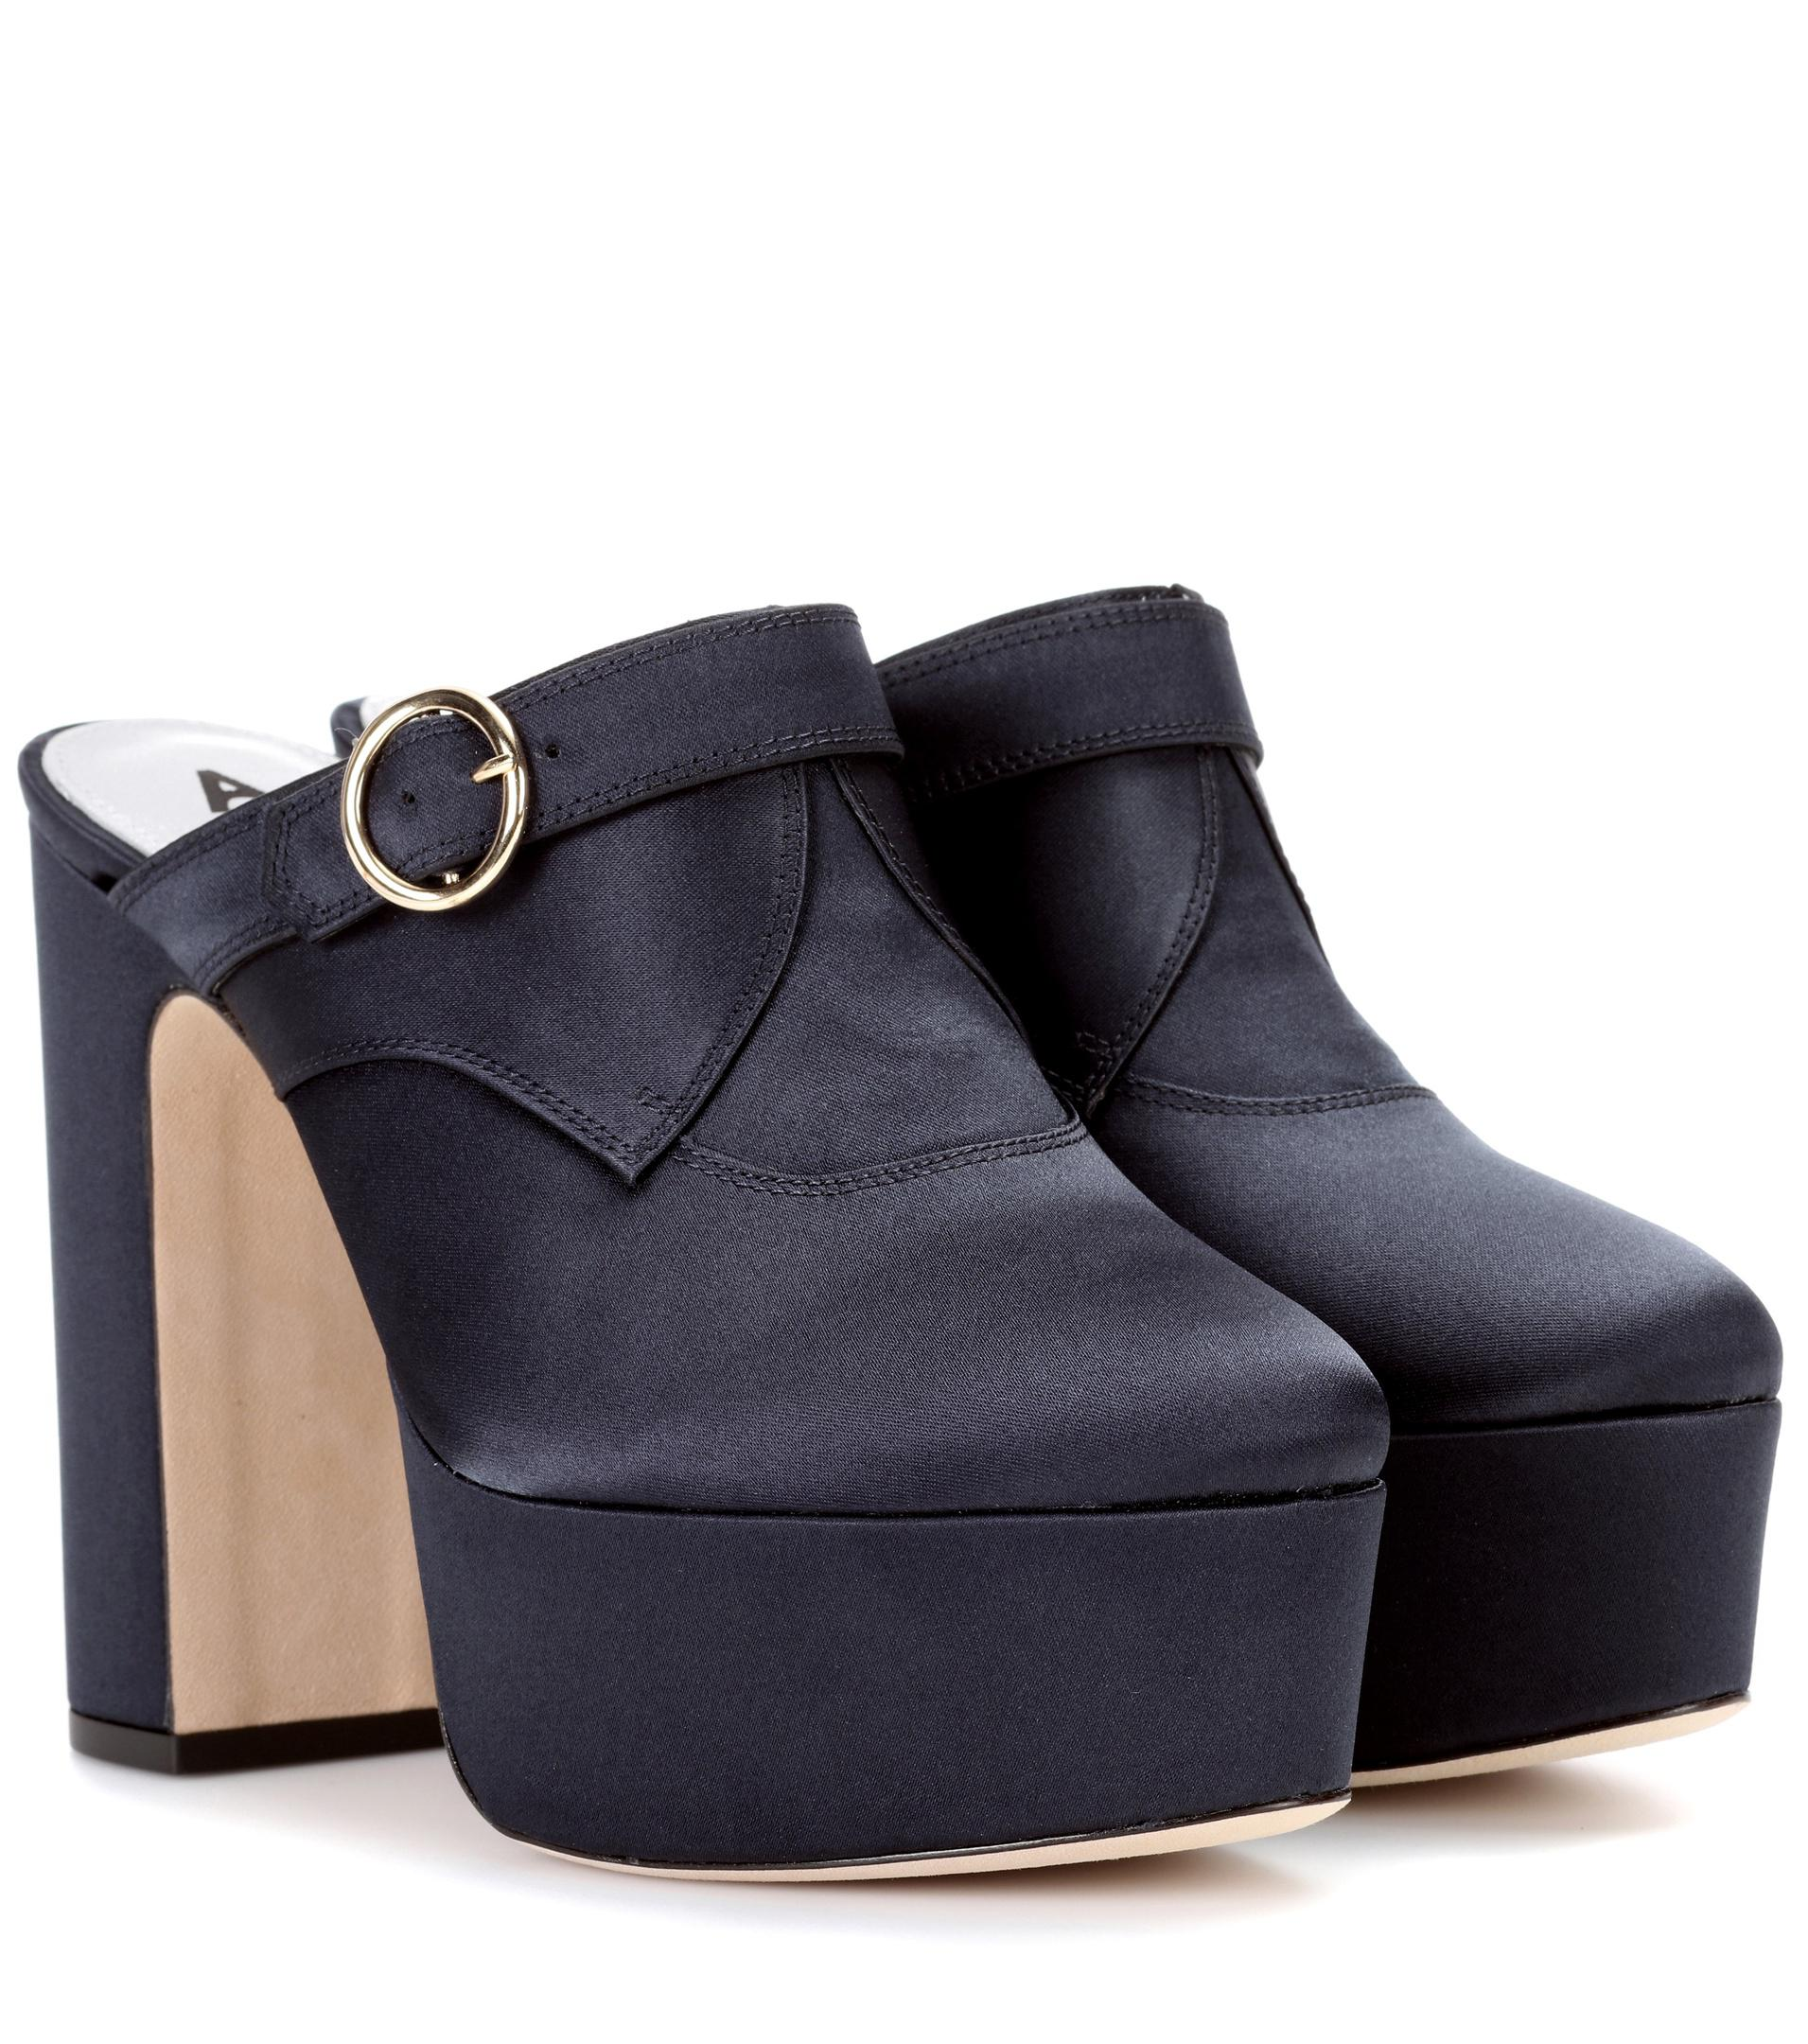 AlexaChung Woman Buckled Patent-leather Platform Mules Size 40 AlQuSWc